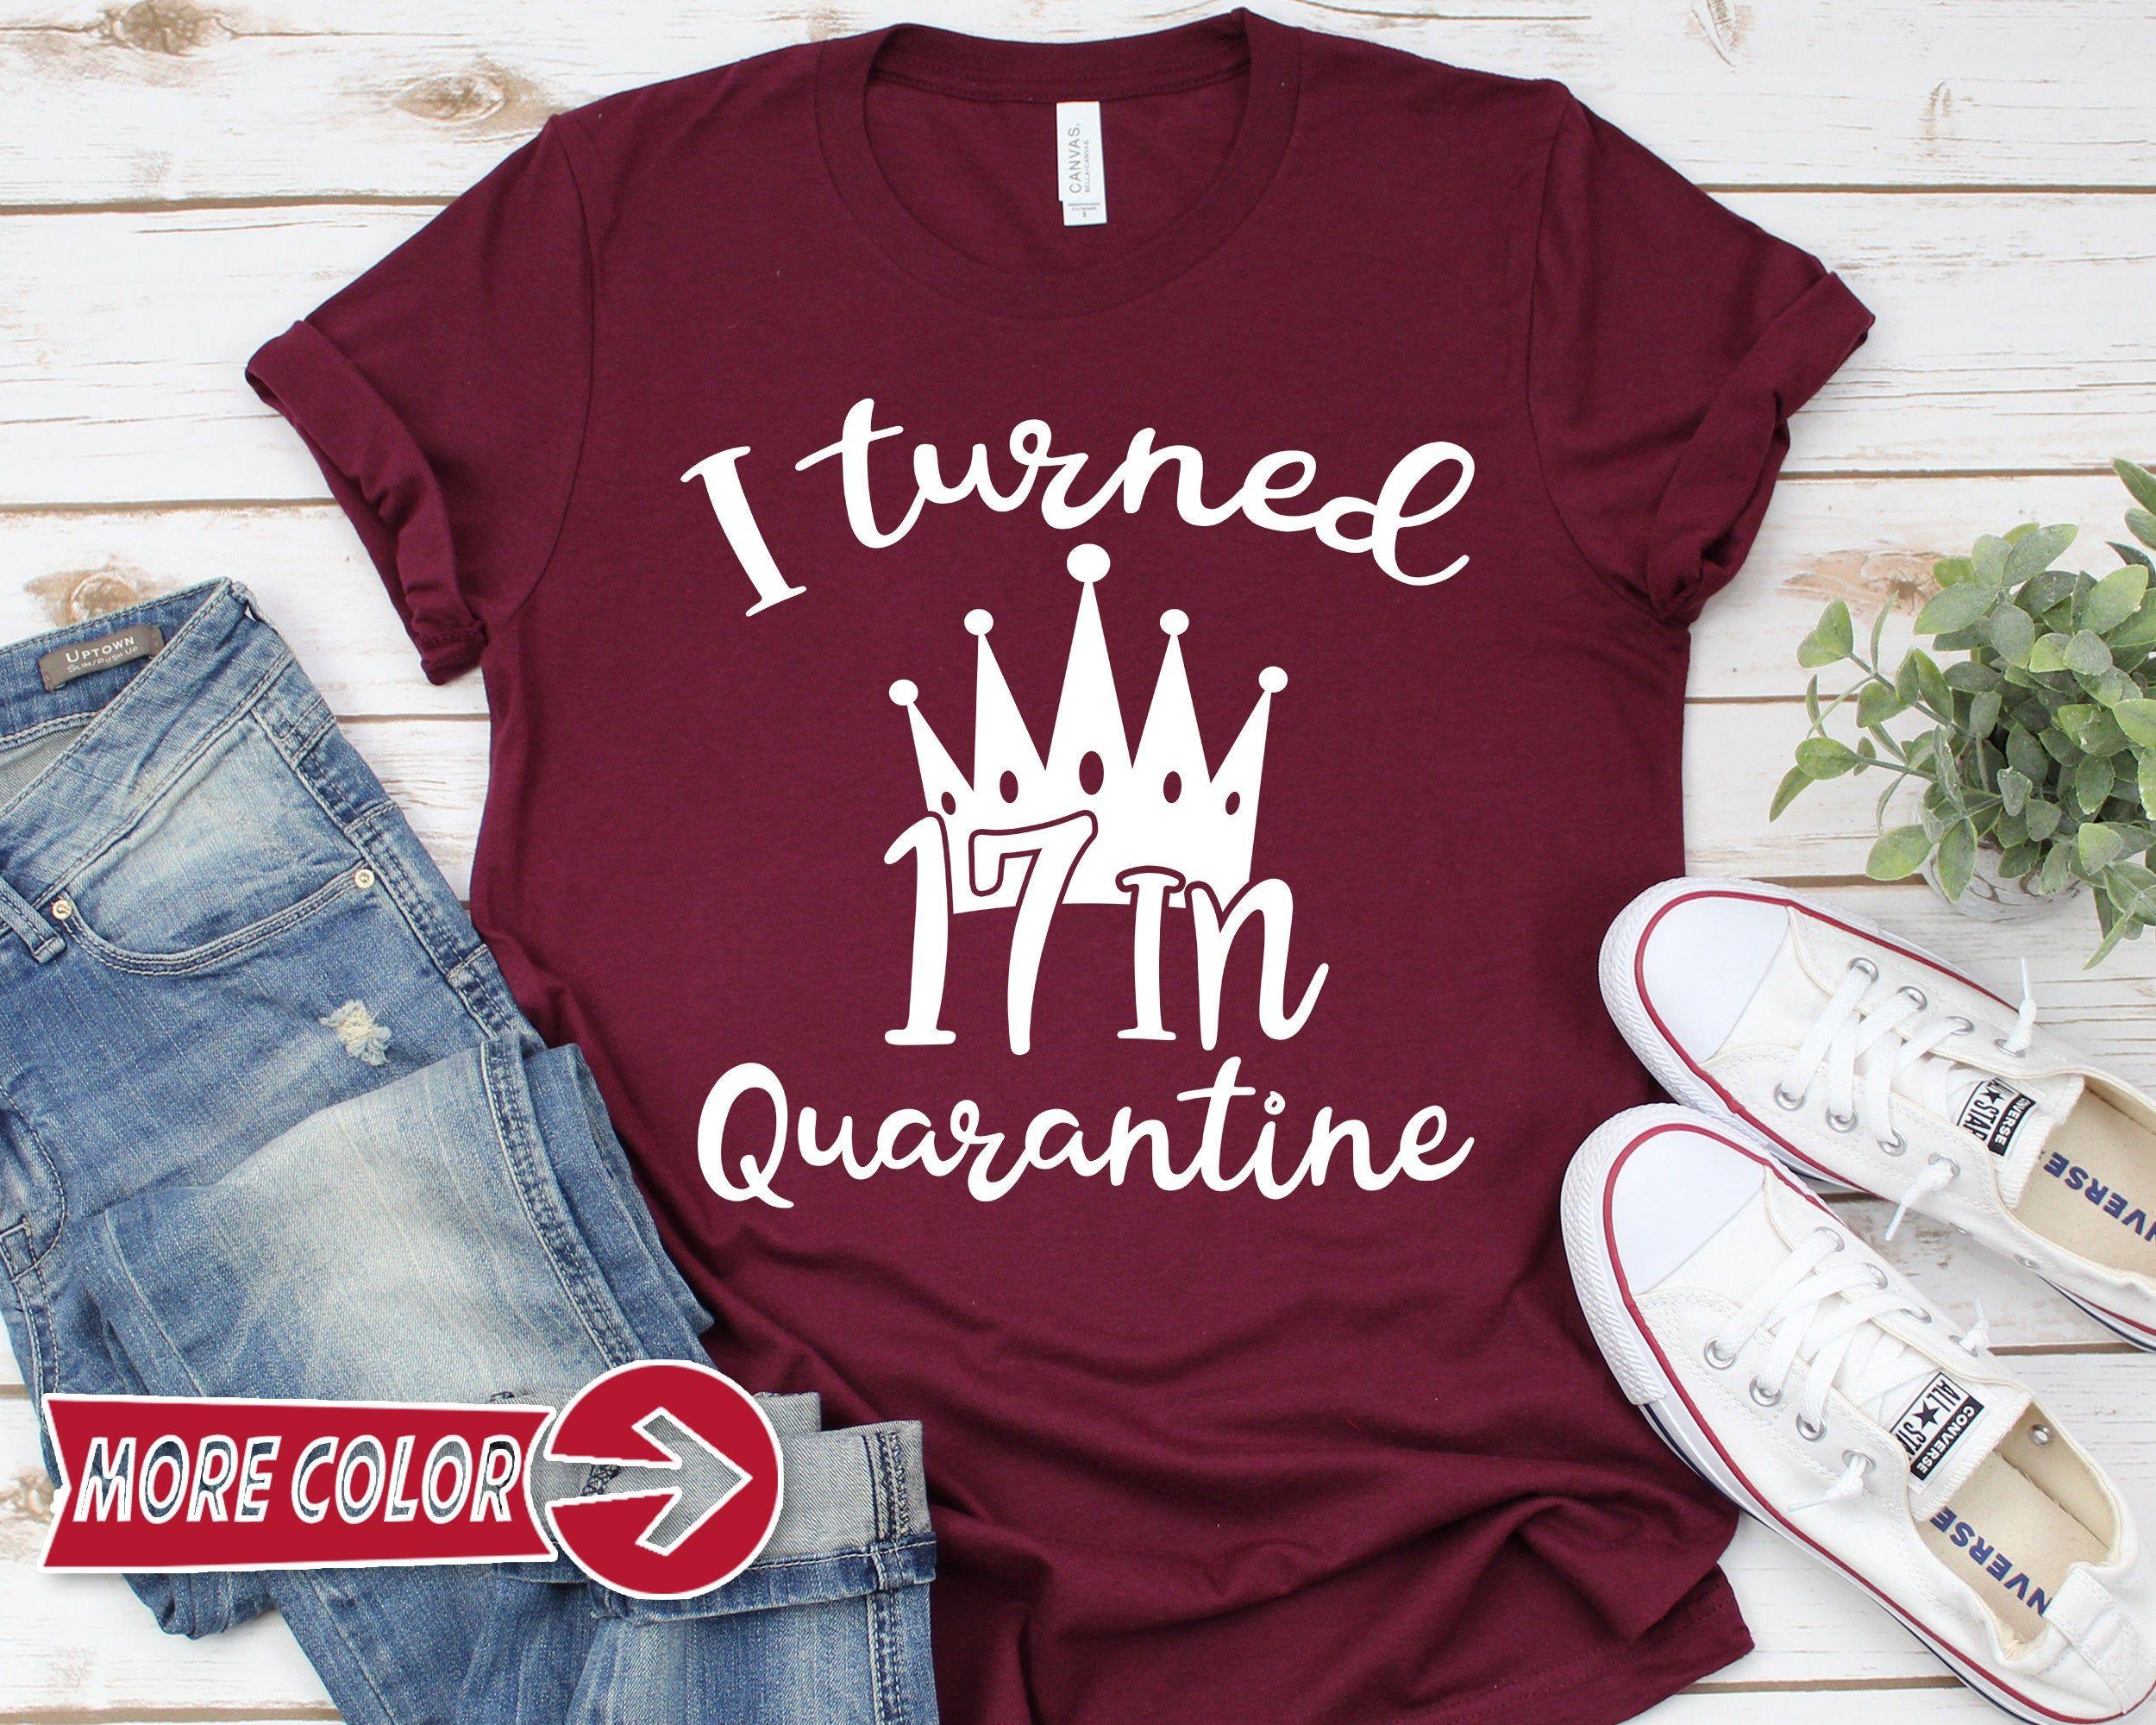 Custom Quarantined Birthday Shirt, 17th Birthday, Social Distancing Tee, Birthday Queen Tee, I Turned Age In Quarantine, Funny Friends Shirt